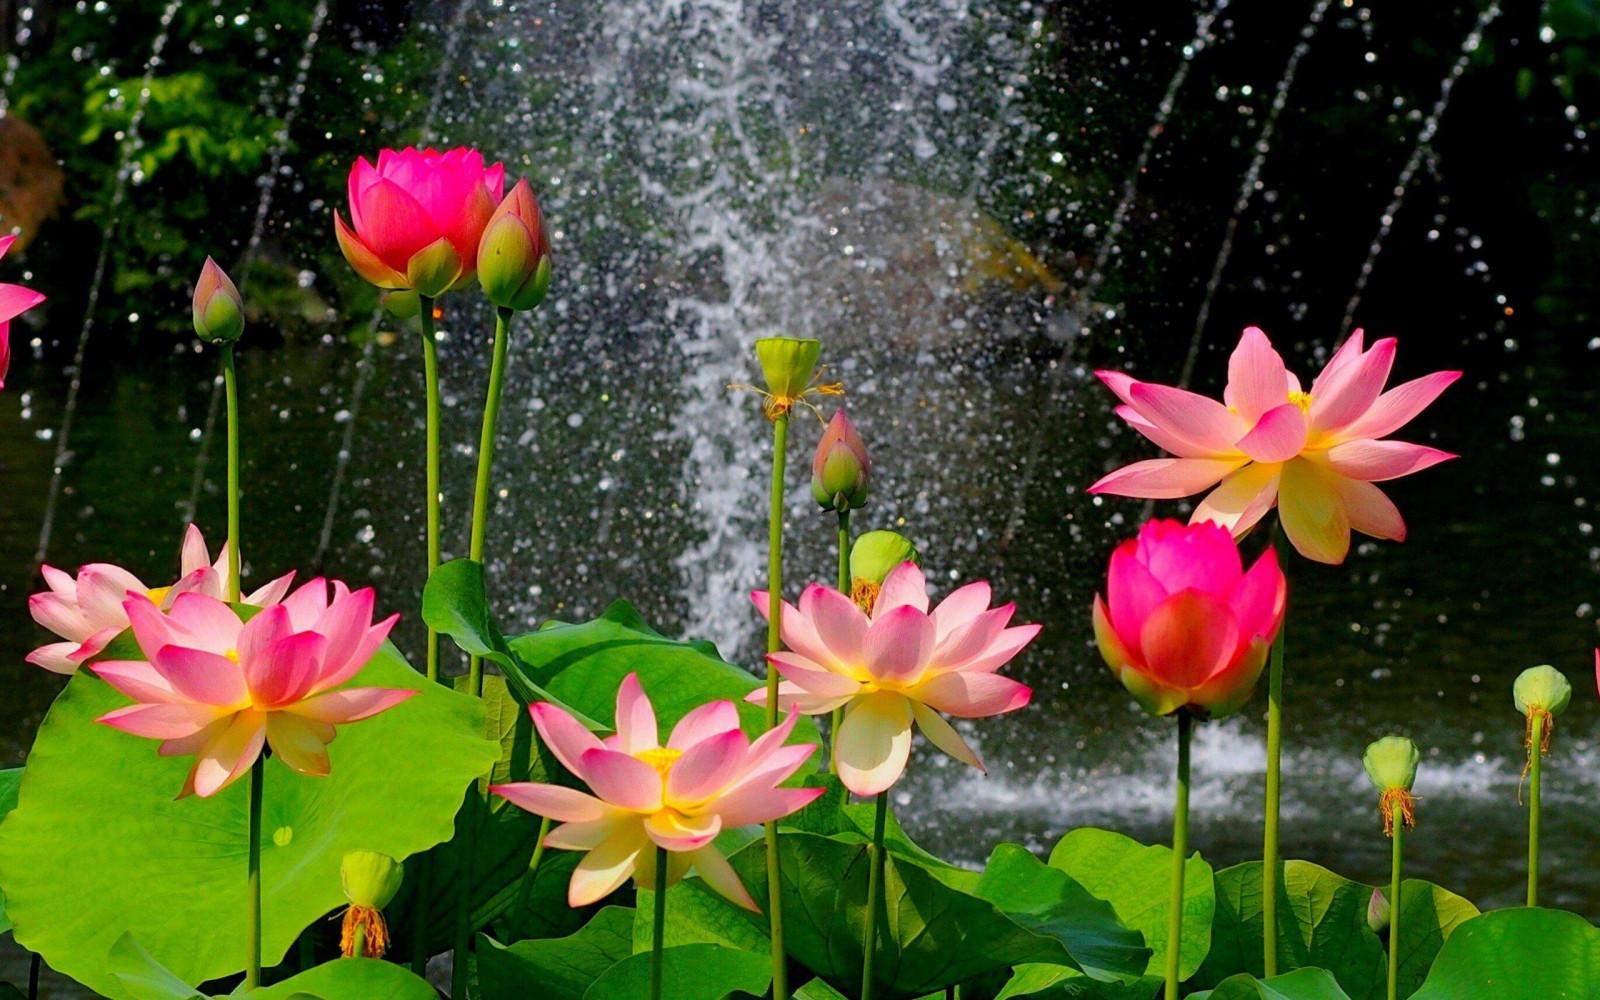 Wallpaper Flowers Garden Nature Lotus Flower Lily